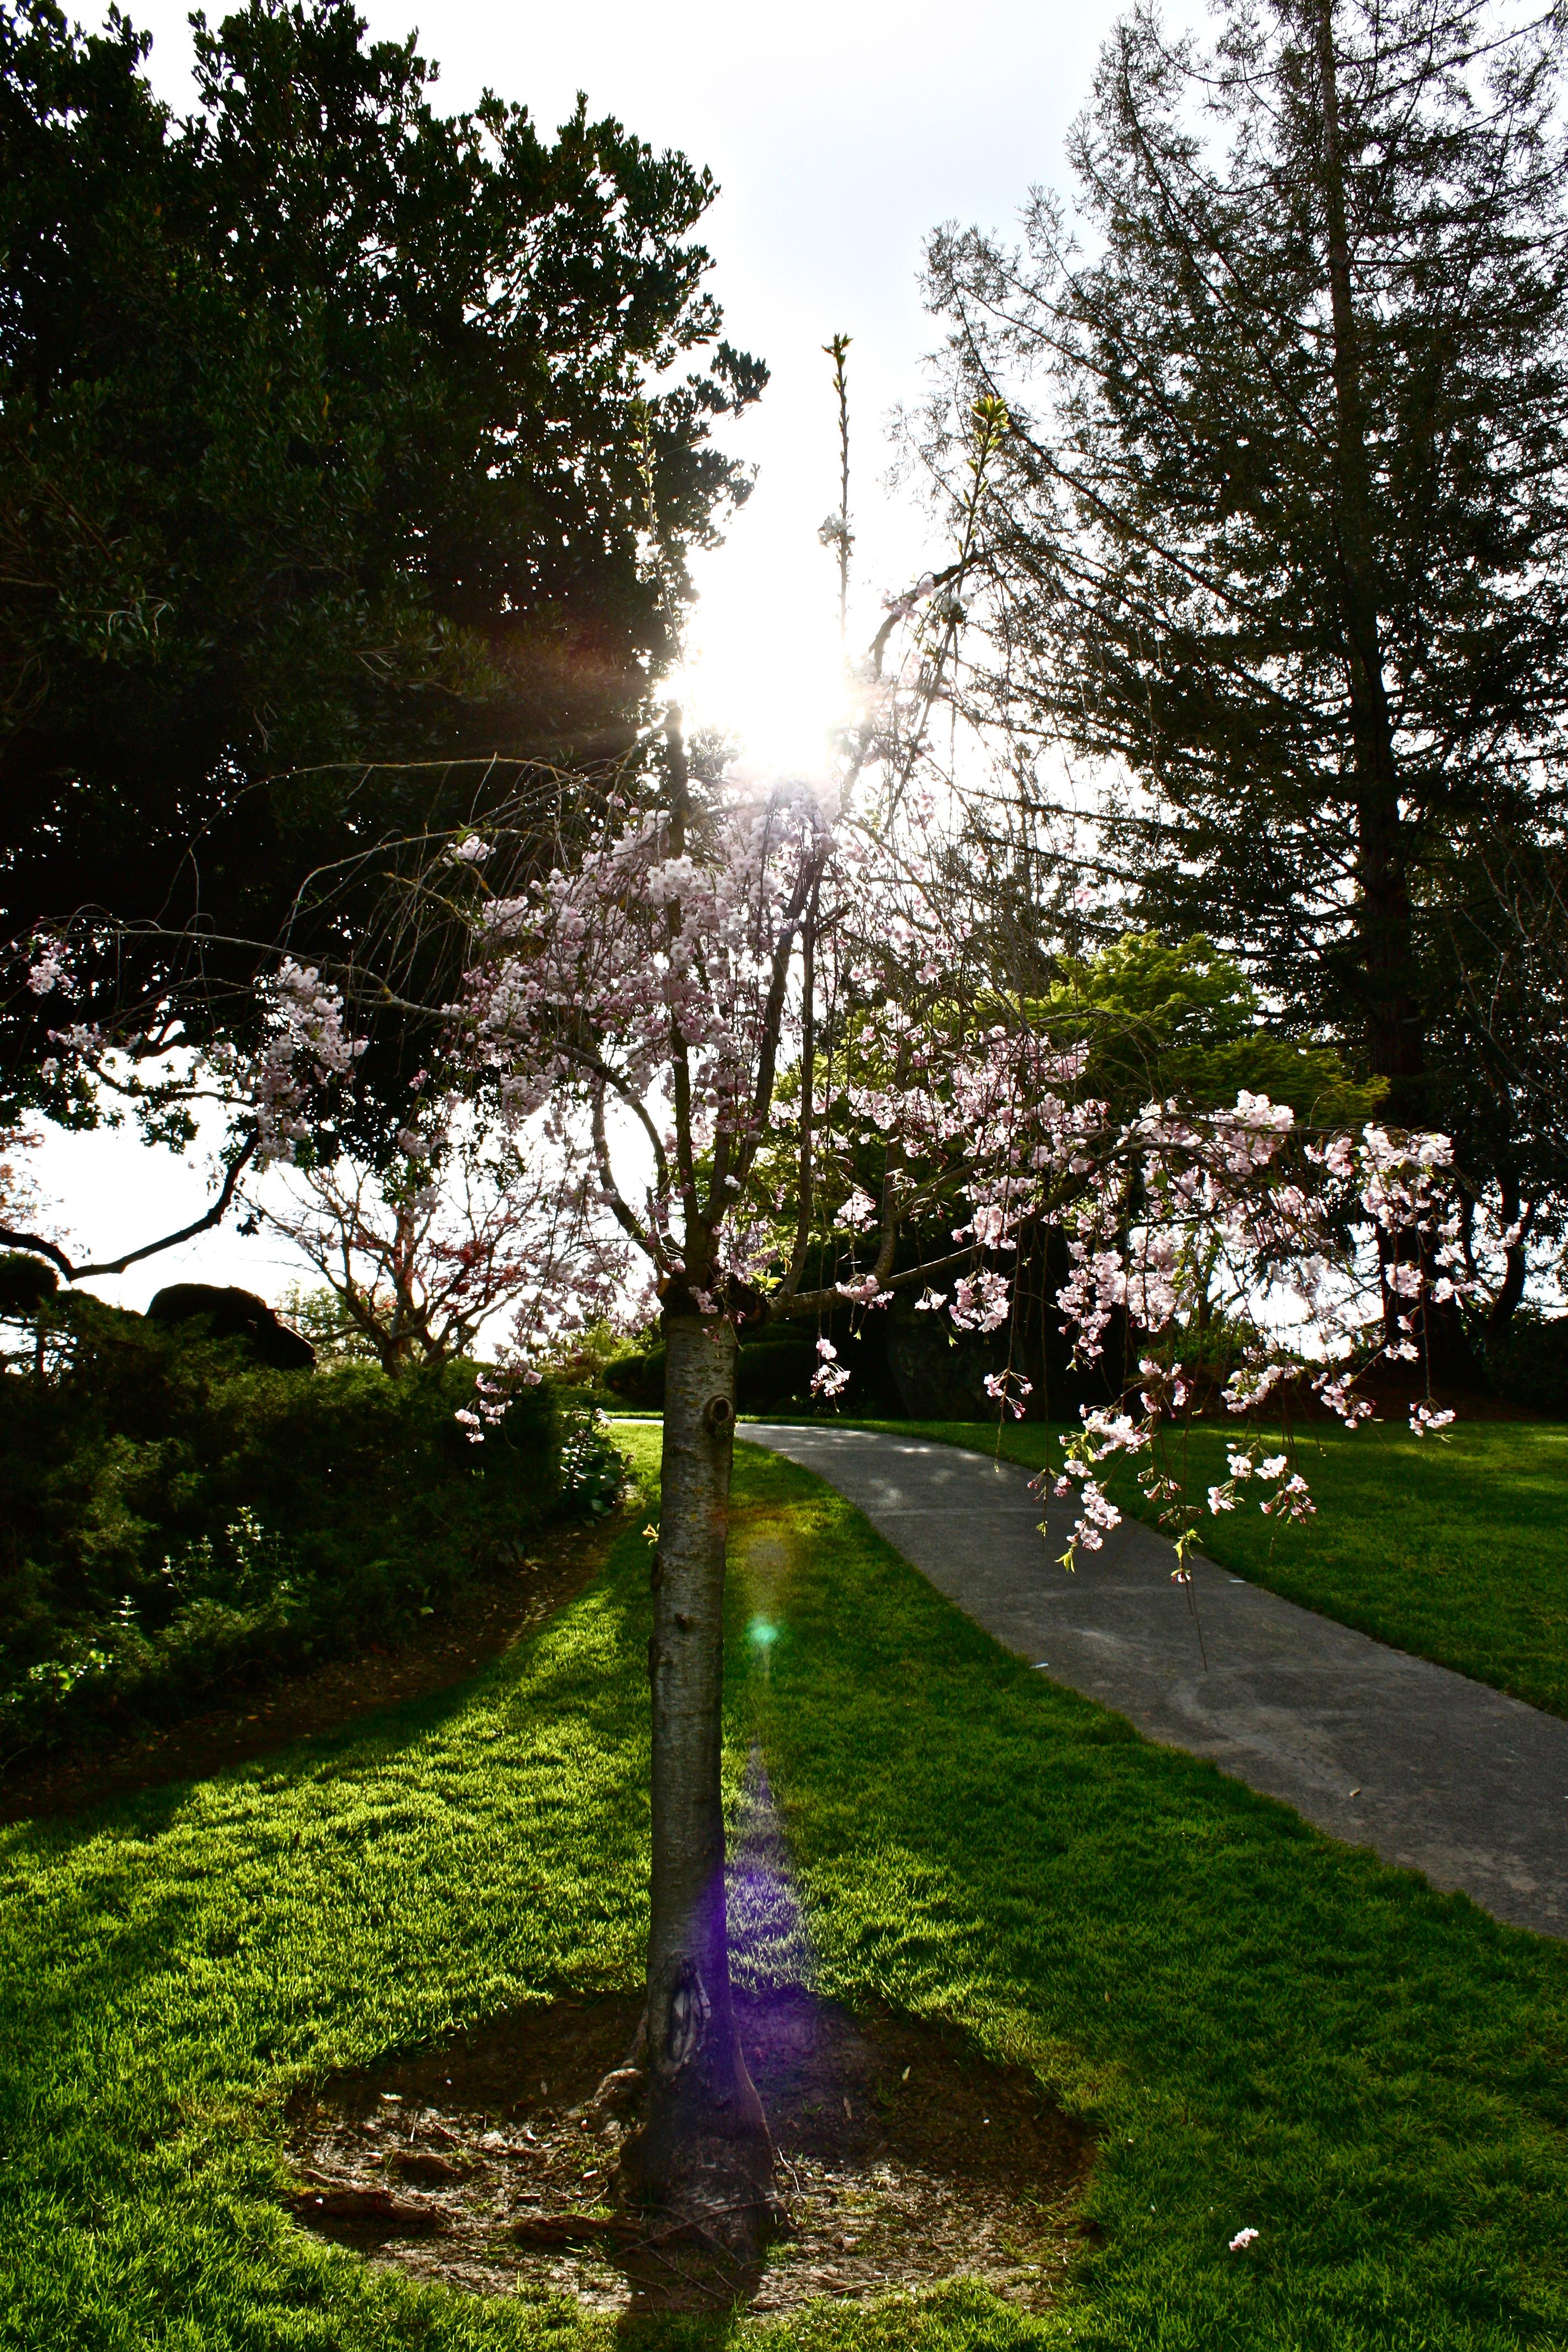 file:cherry blossom at japanese friendship garden in san jose